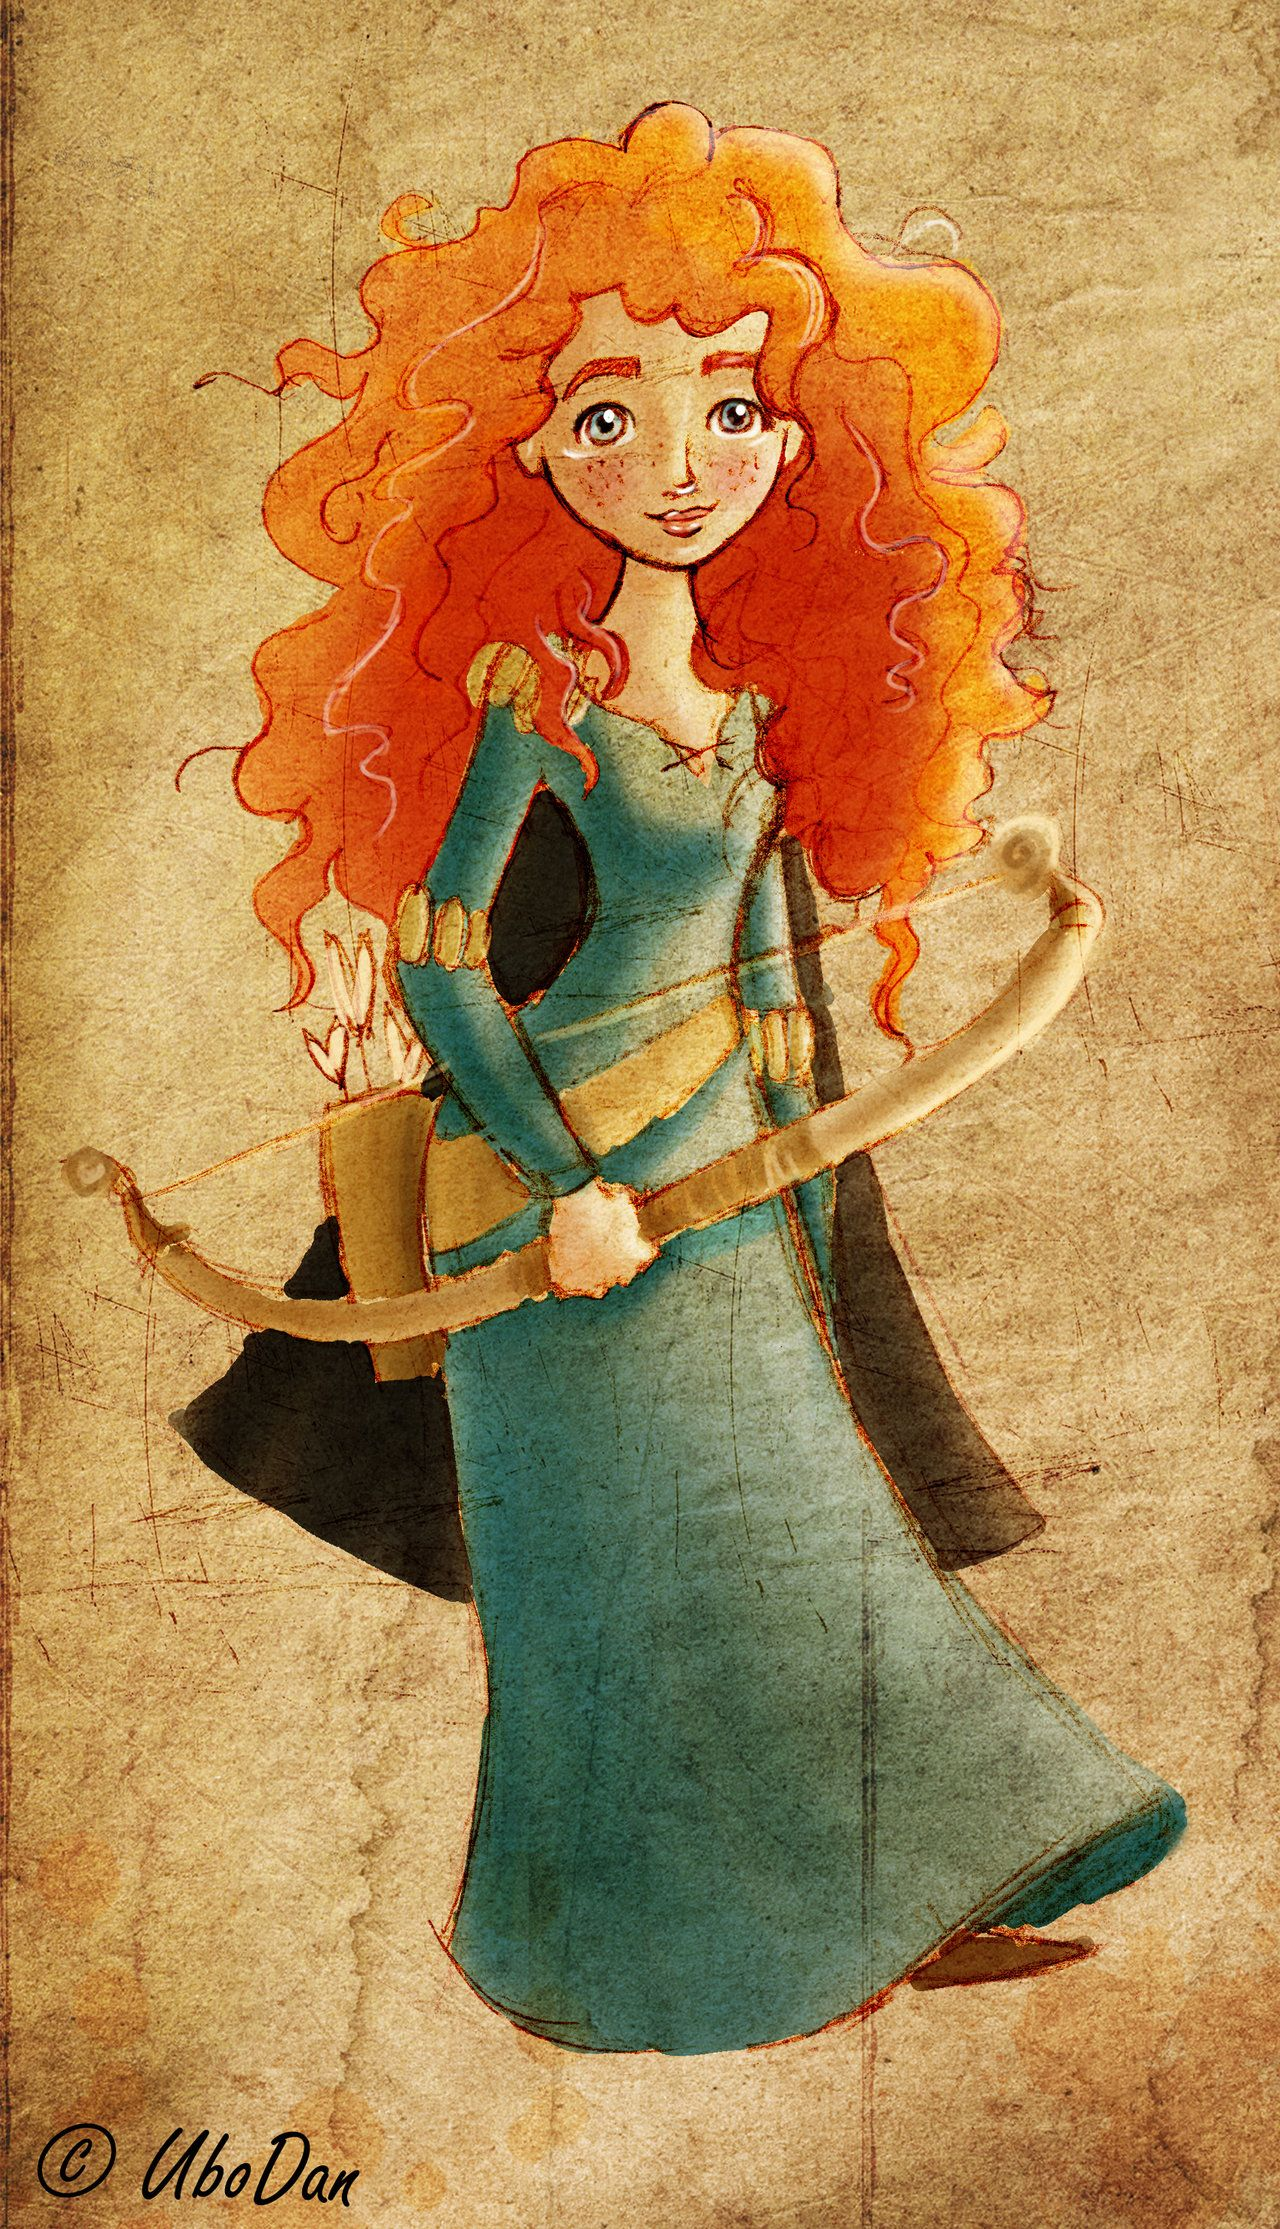 Princess Merida Ubodan Deviantart Disney Stuff Brave